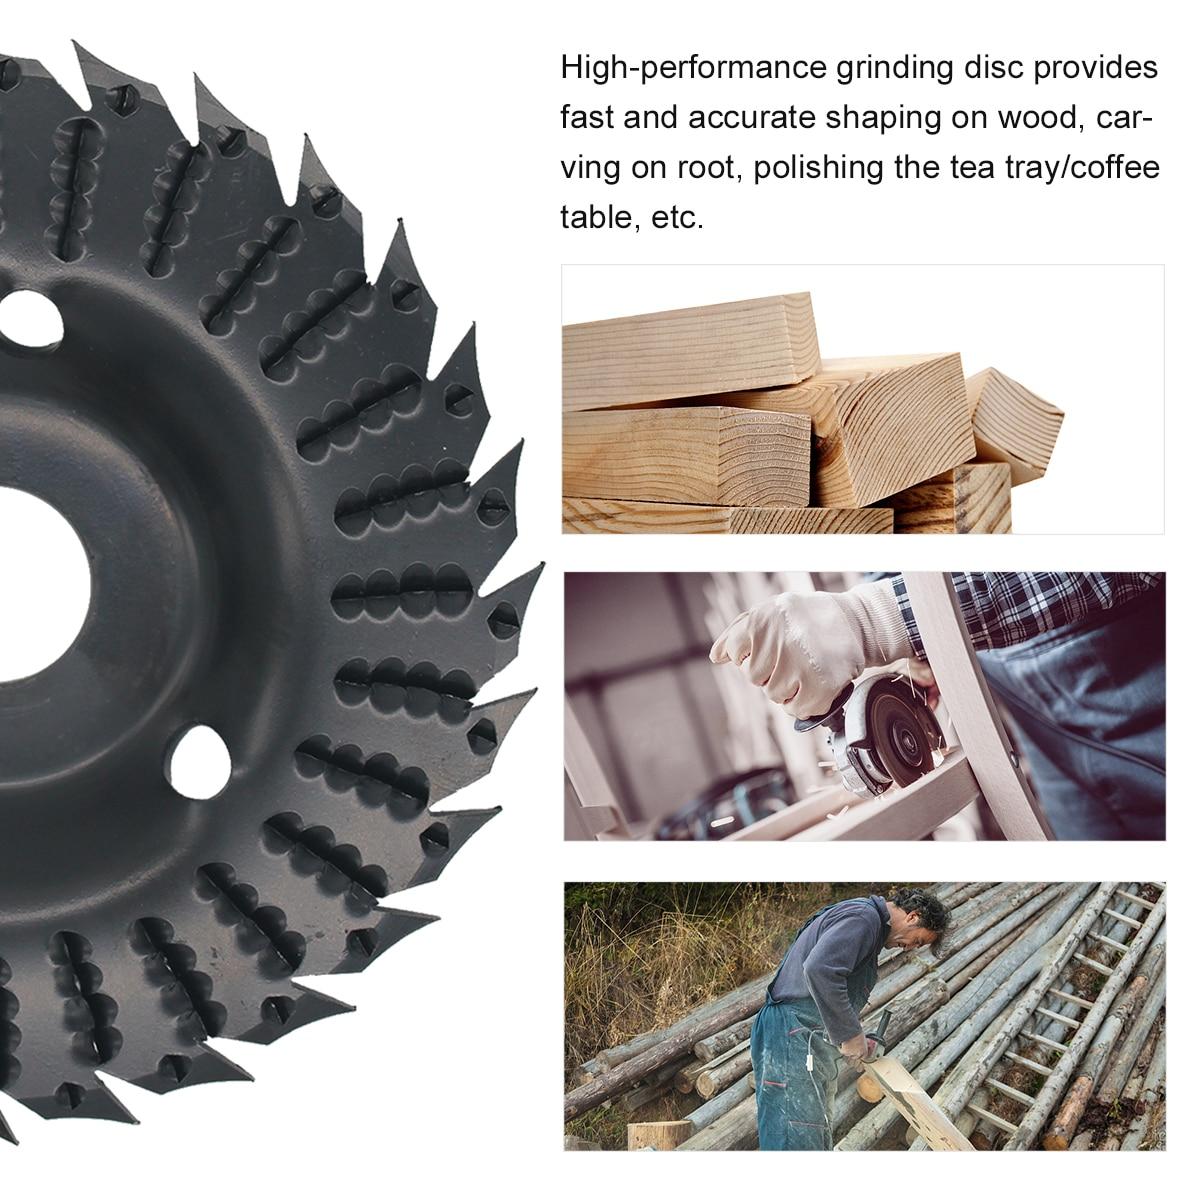 KKmoon 2pcs Angle Grinder Grinding Disc 28 Teeth Wood Grinding Wheel Abrasive Disc Woodworking Wood Shaping Disc Grinding Disc